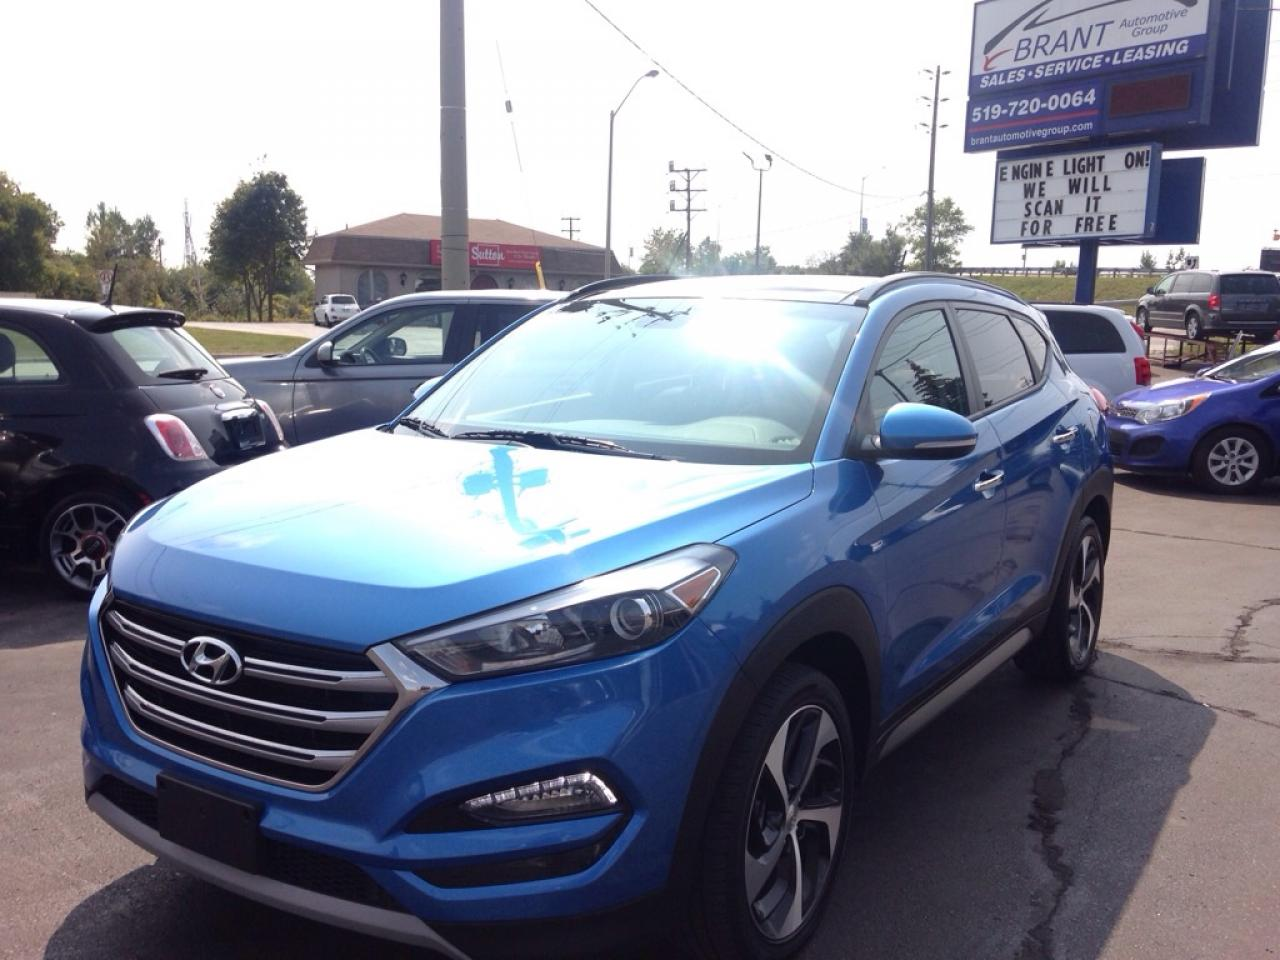 2017 Hyundai Tucson SE AWD, leather, panoramic sunroof!